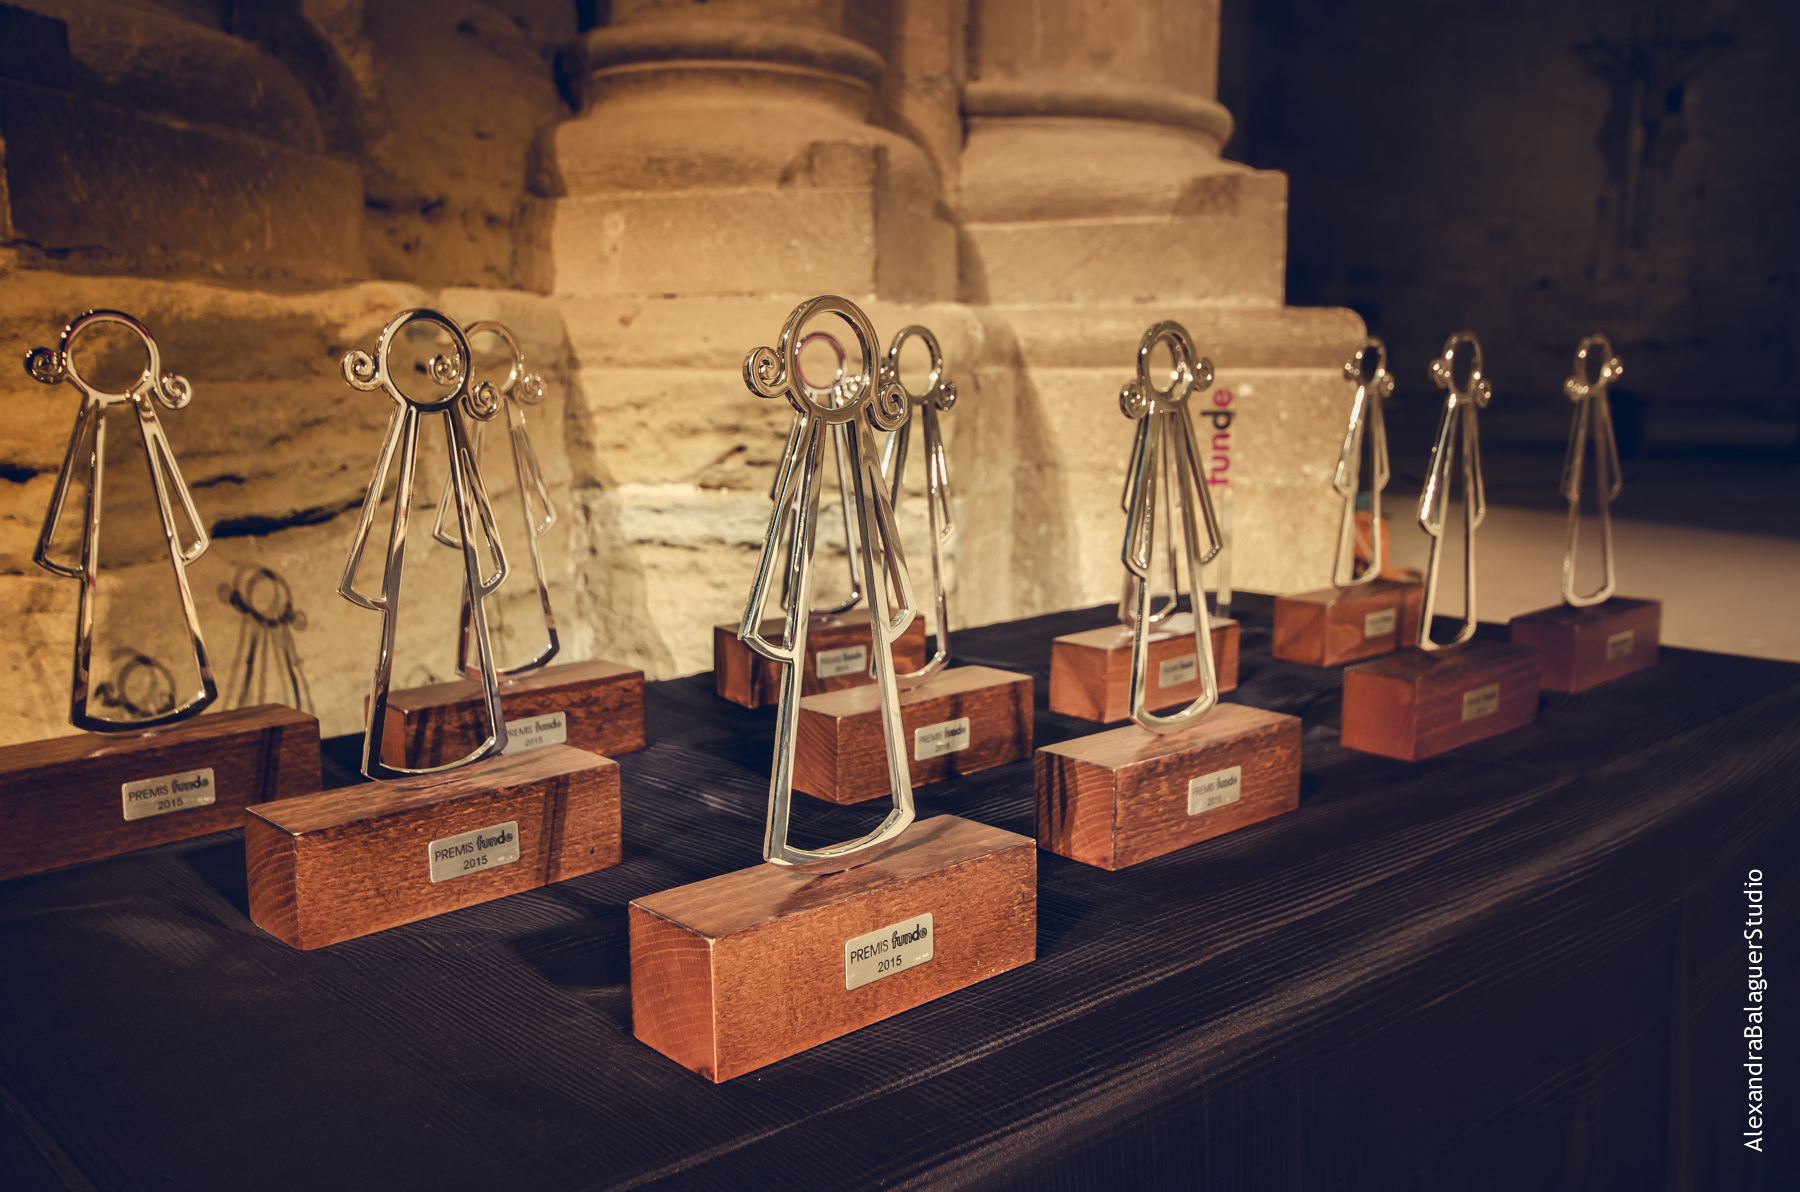 Gala Premis Funde 2015